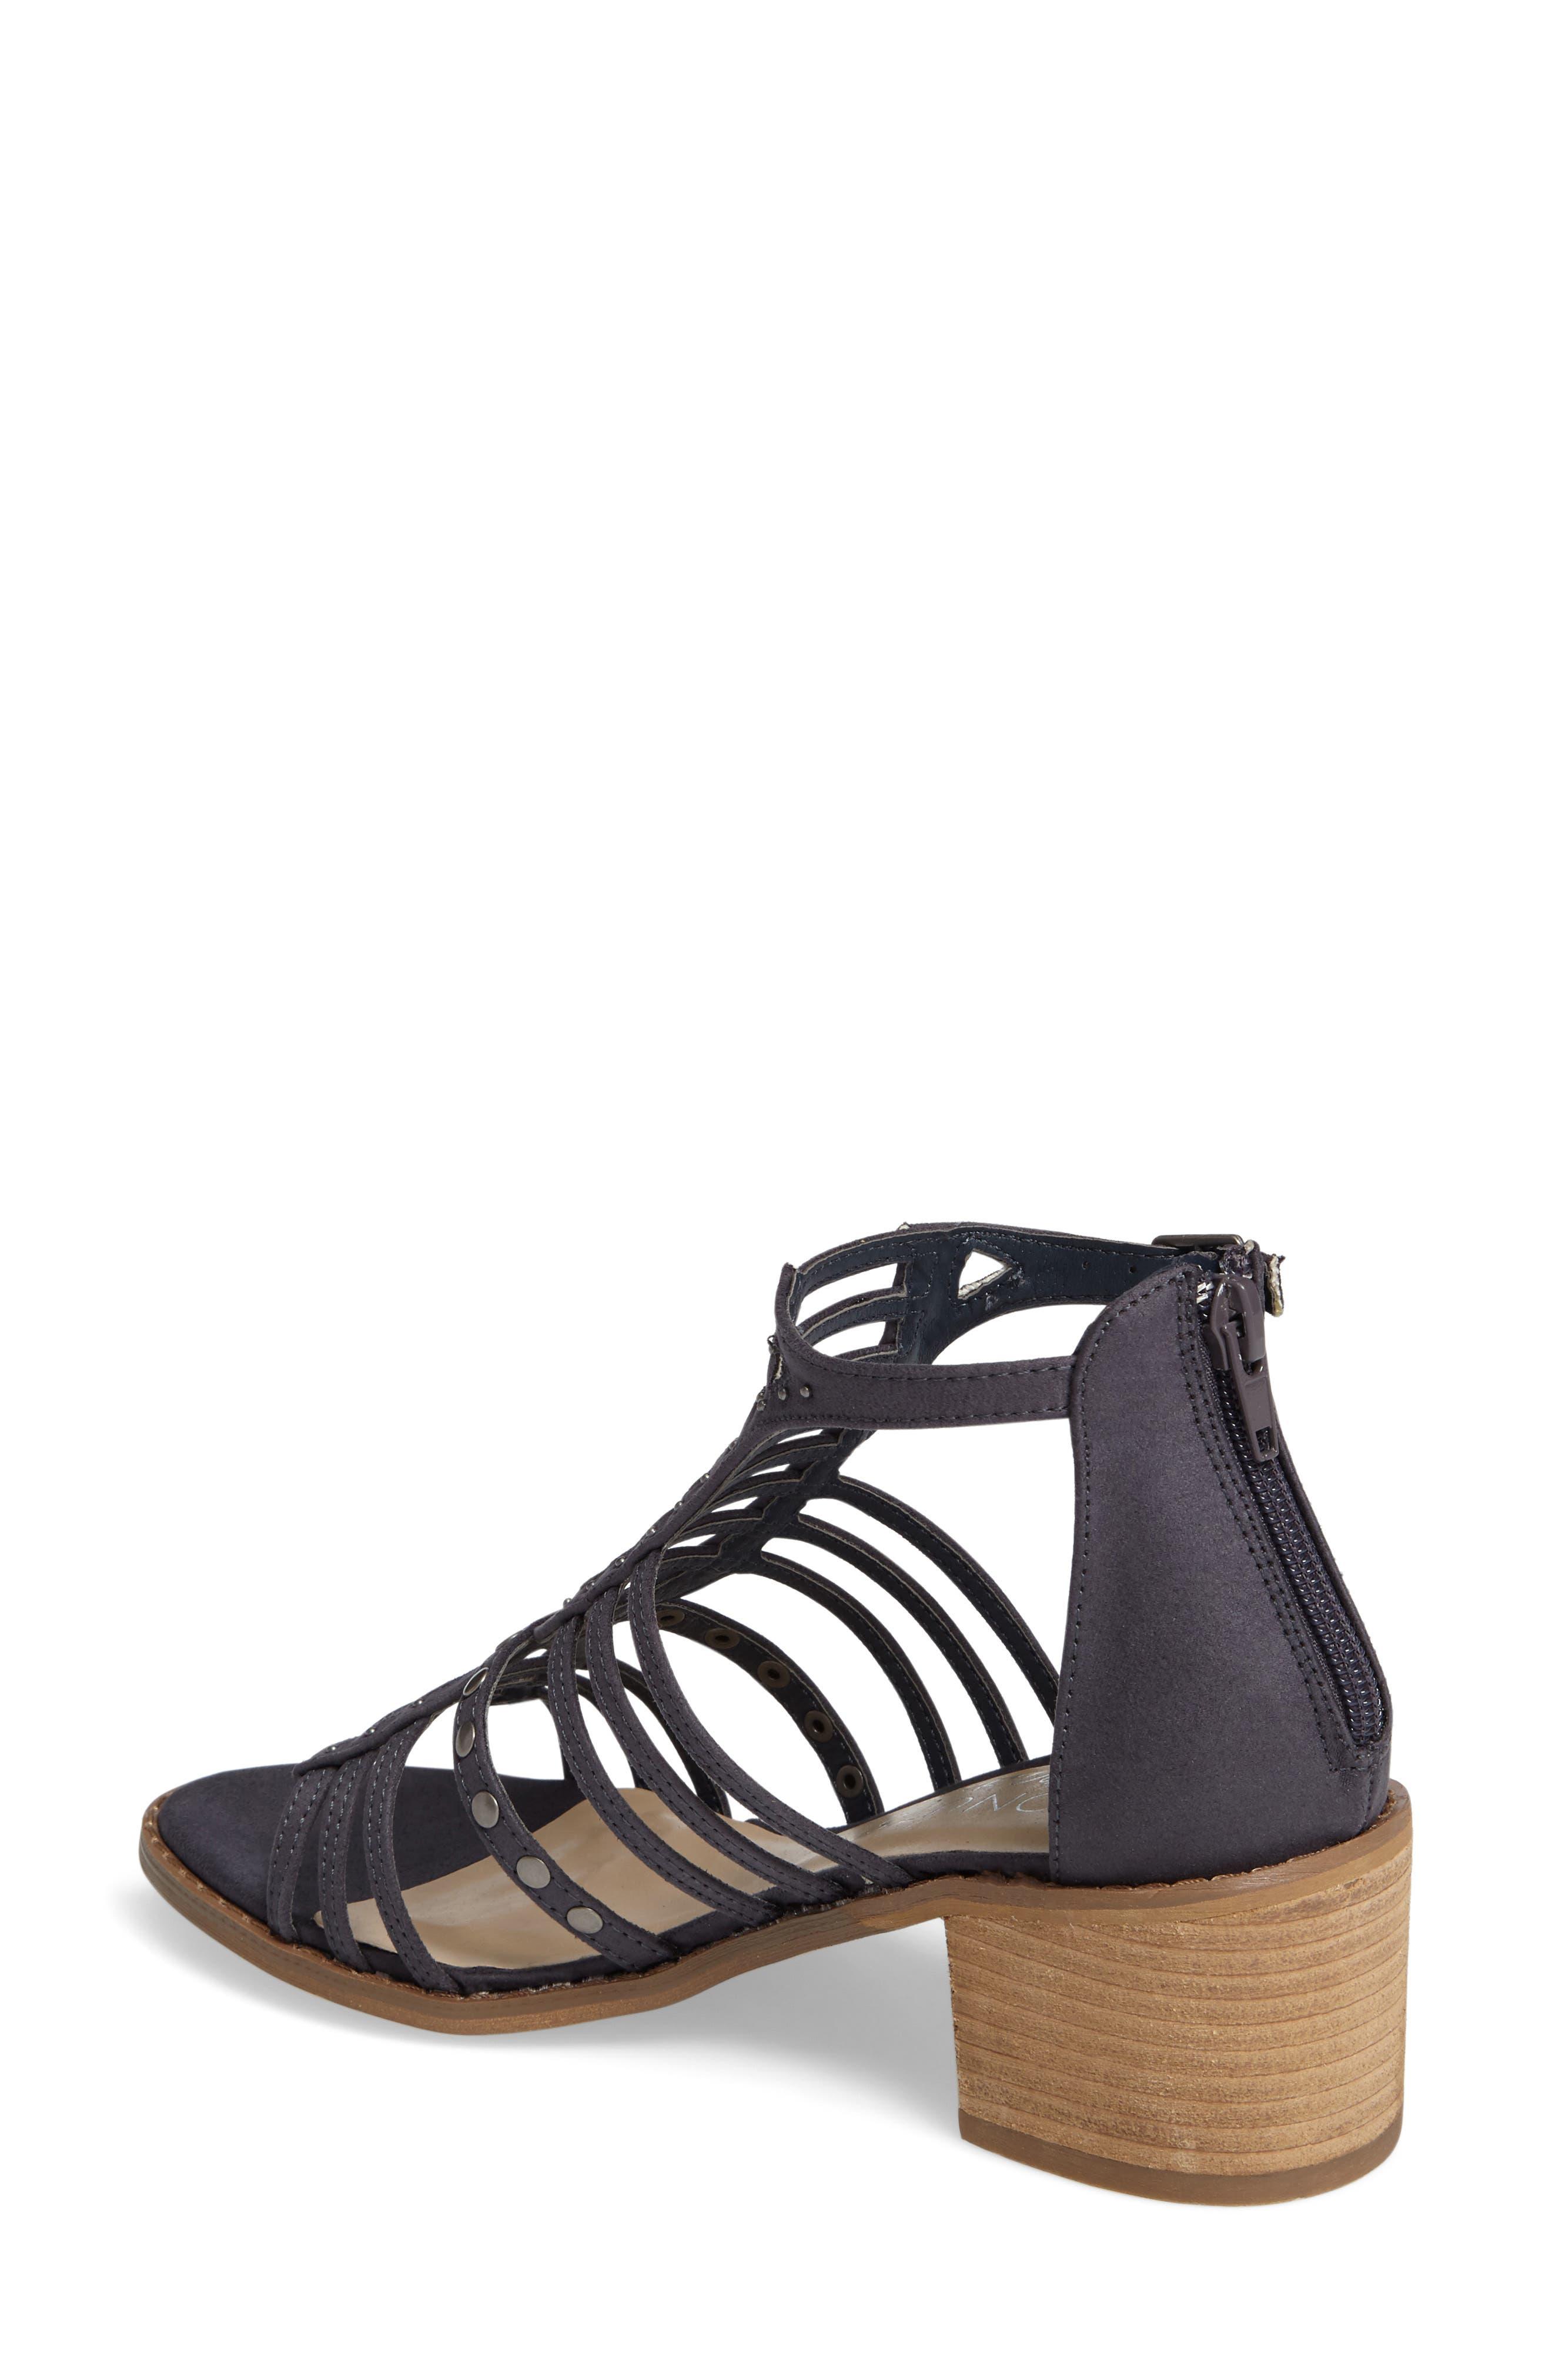 Matisse Essence Sandal,                             Alternate thumbnail 4, color,